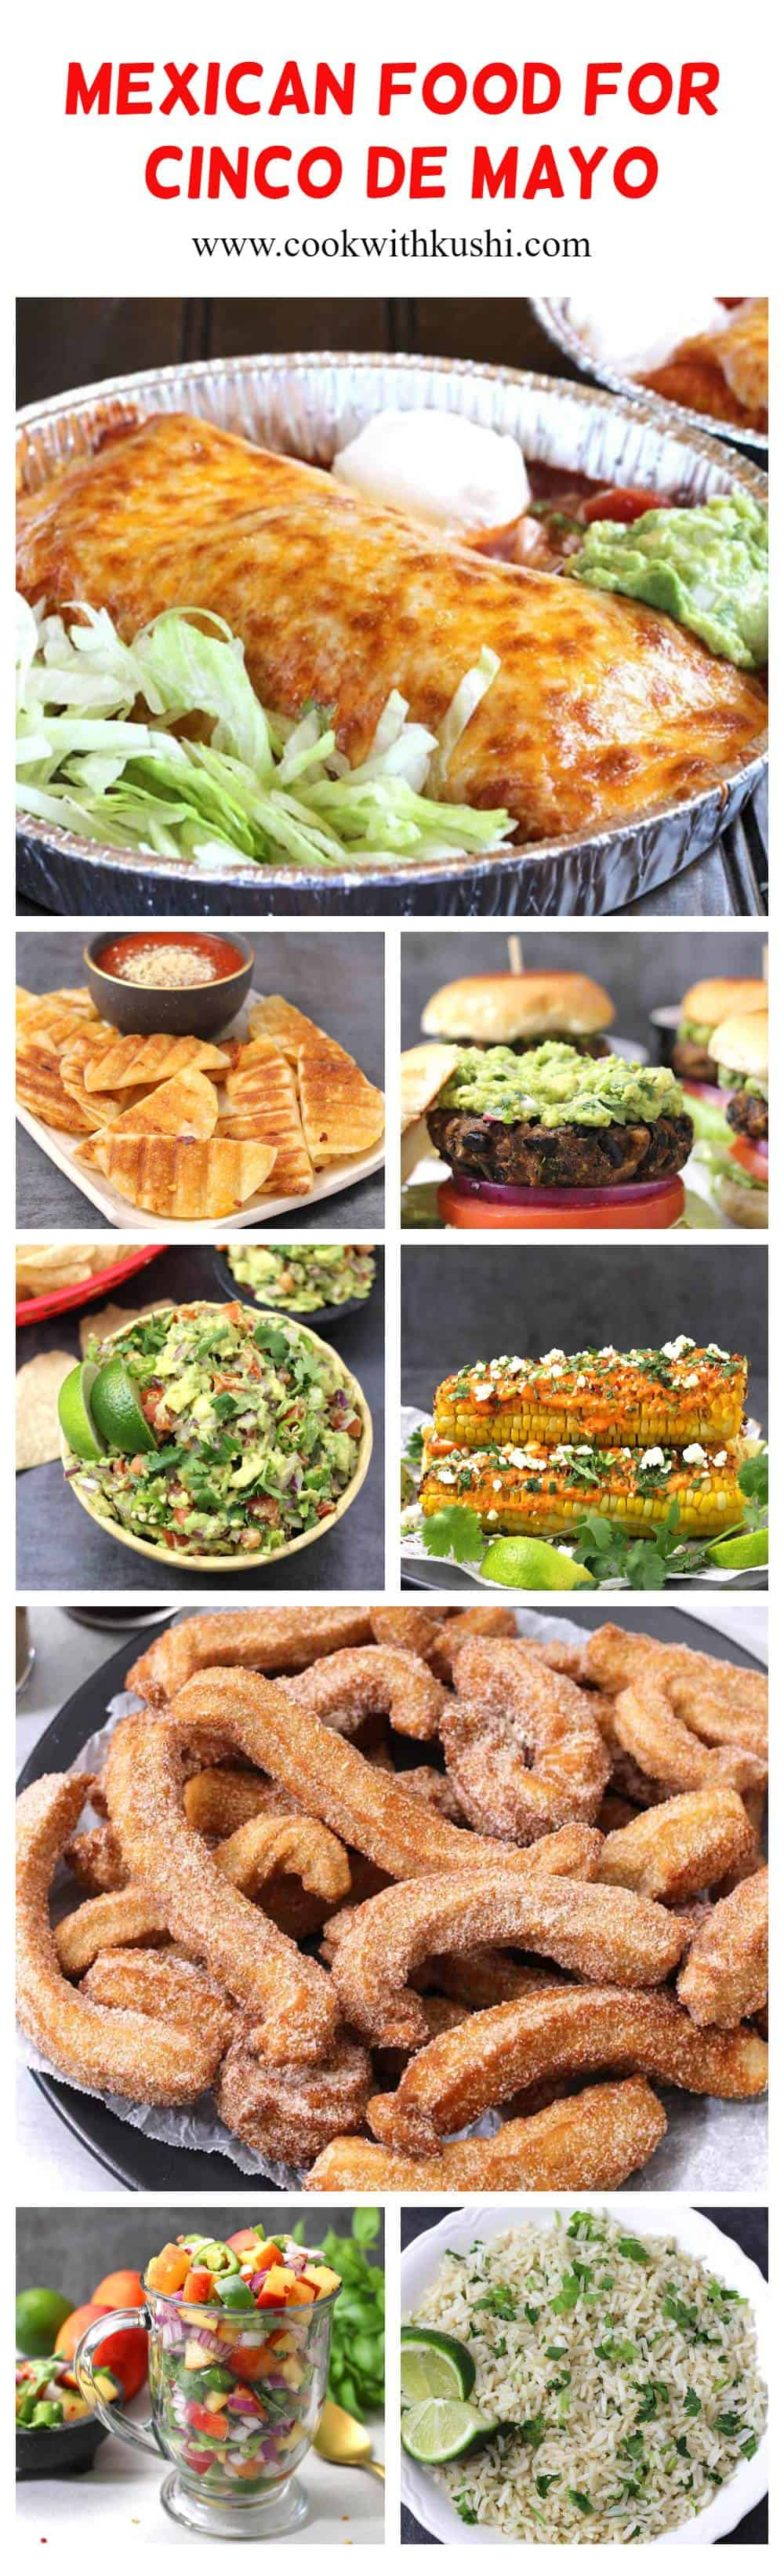 10 best & easy mexican food recipes for cinco de mayo #cincodemayopartyfood #cincodemayodesserts #cincodemayodinner #mexicanfood #authenticmexican #mexicanrecipes #mexicancuisine #texmex #churros #enchiladas #fajitas #empanadas #chimichangas #tostadas #salsa #picodegallo #burritos #refriedbeans #blackbeans #rice #instantpot #keto #vegan #vegetarian #dinnerideas #mealplanning #partyfood #jicama #easyrecipes